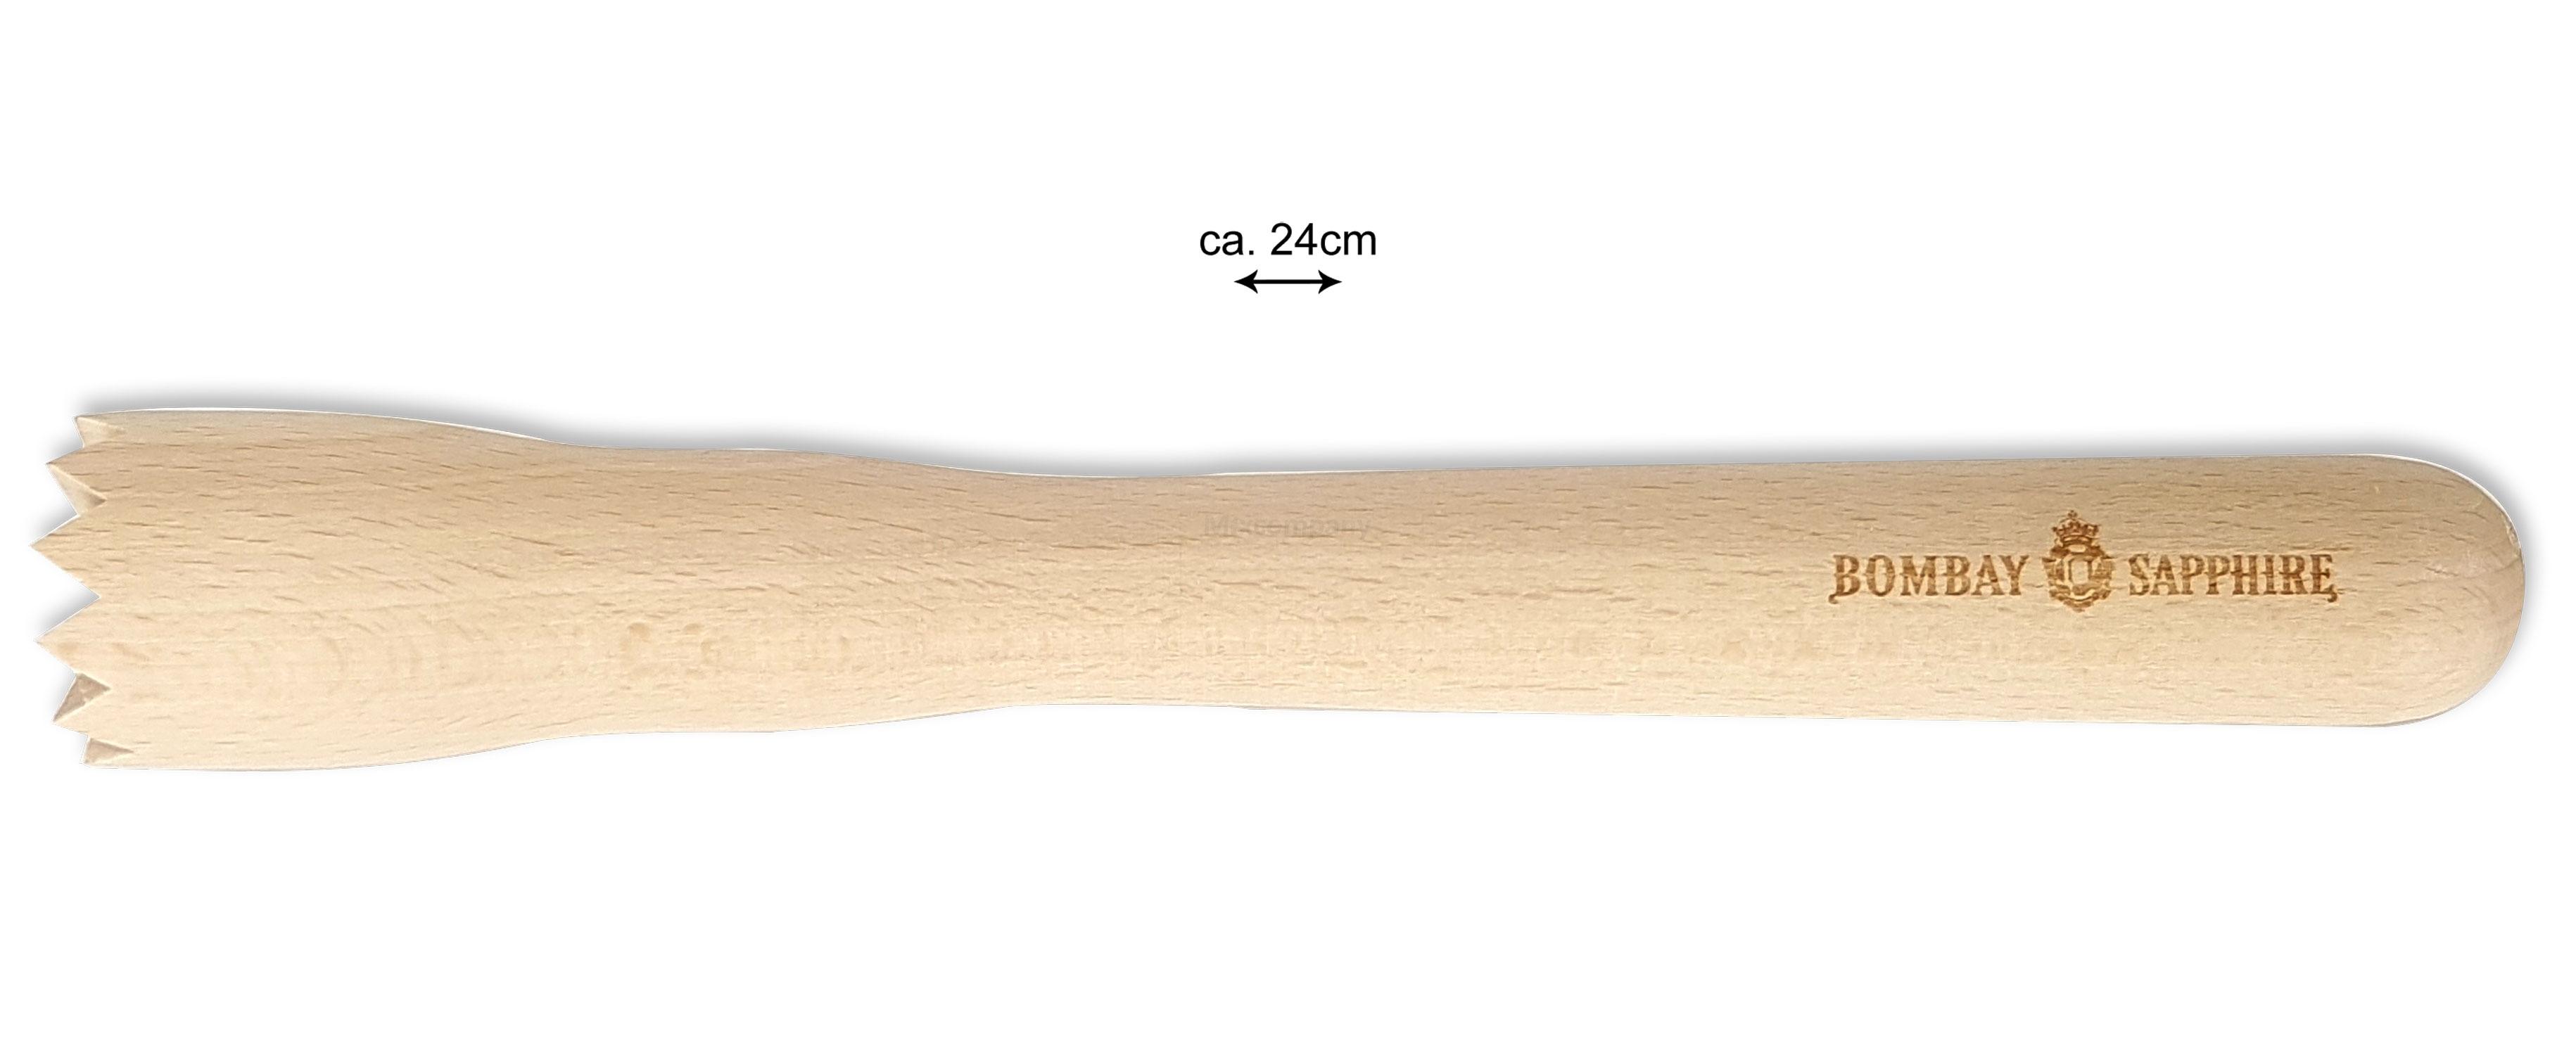 Bombay Sapphire 2x Holzstößel Stößel für Caipirinha